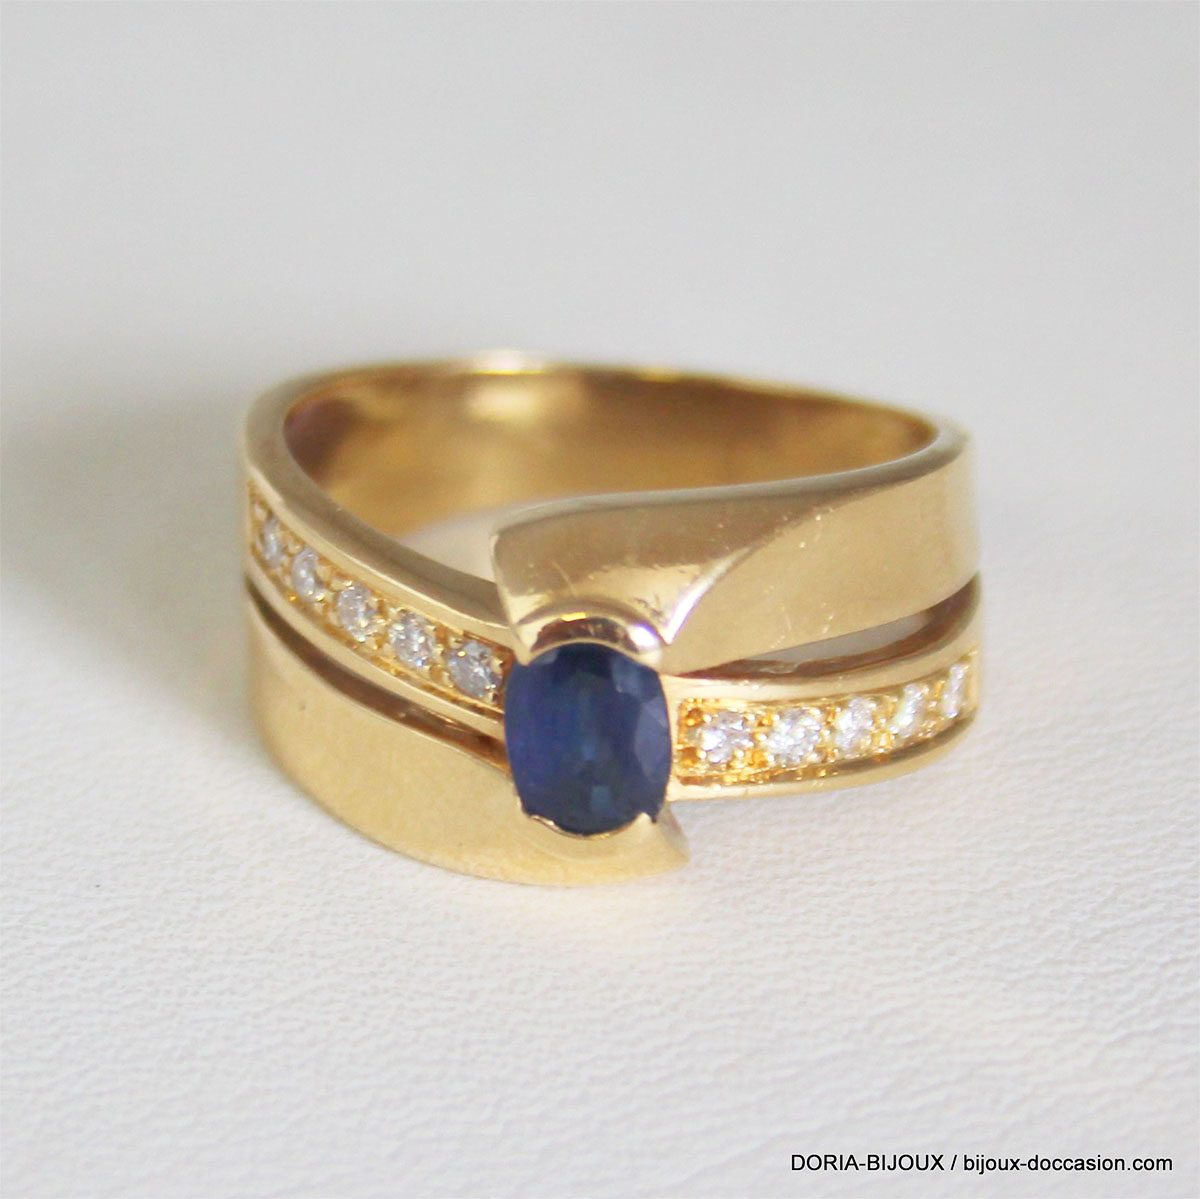 Bague Or 18k 750 Saphirs Diamants 5.7grs - 55